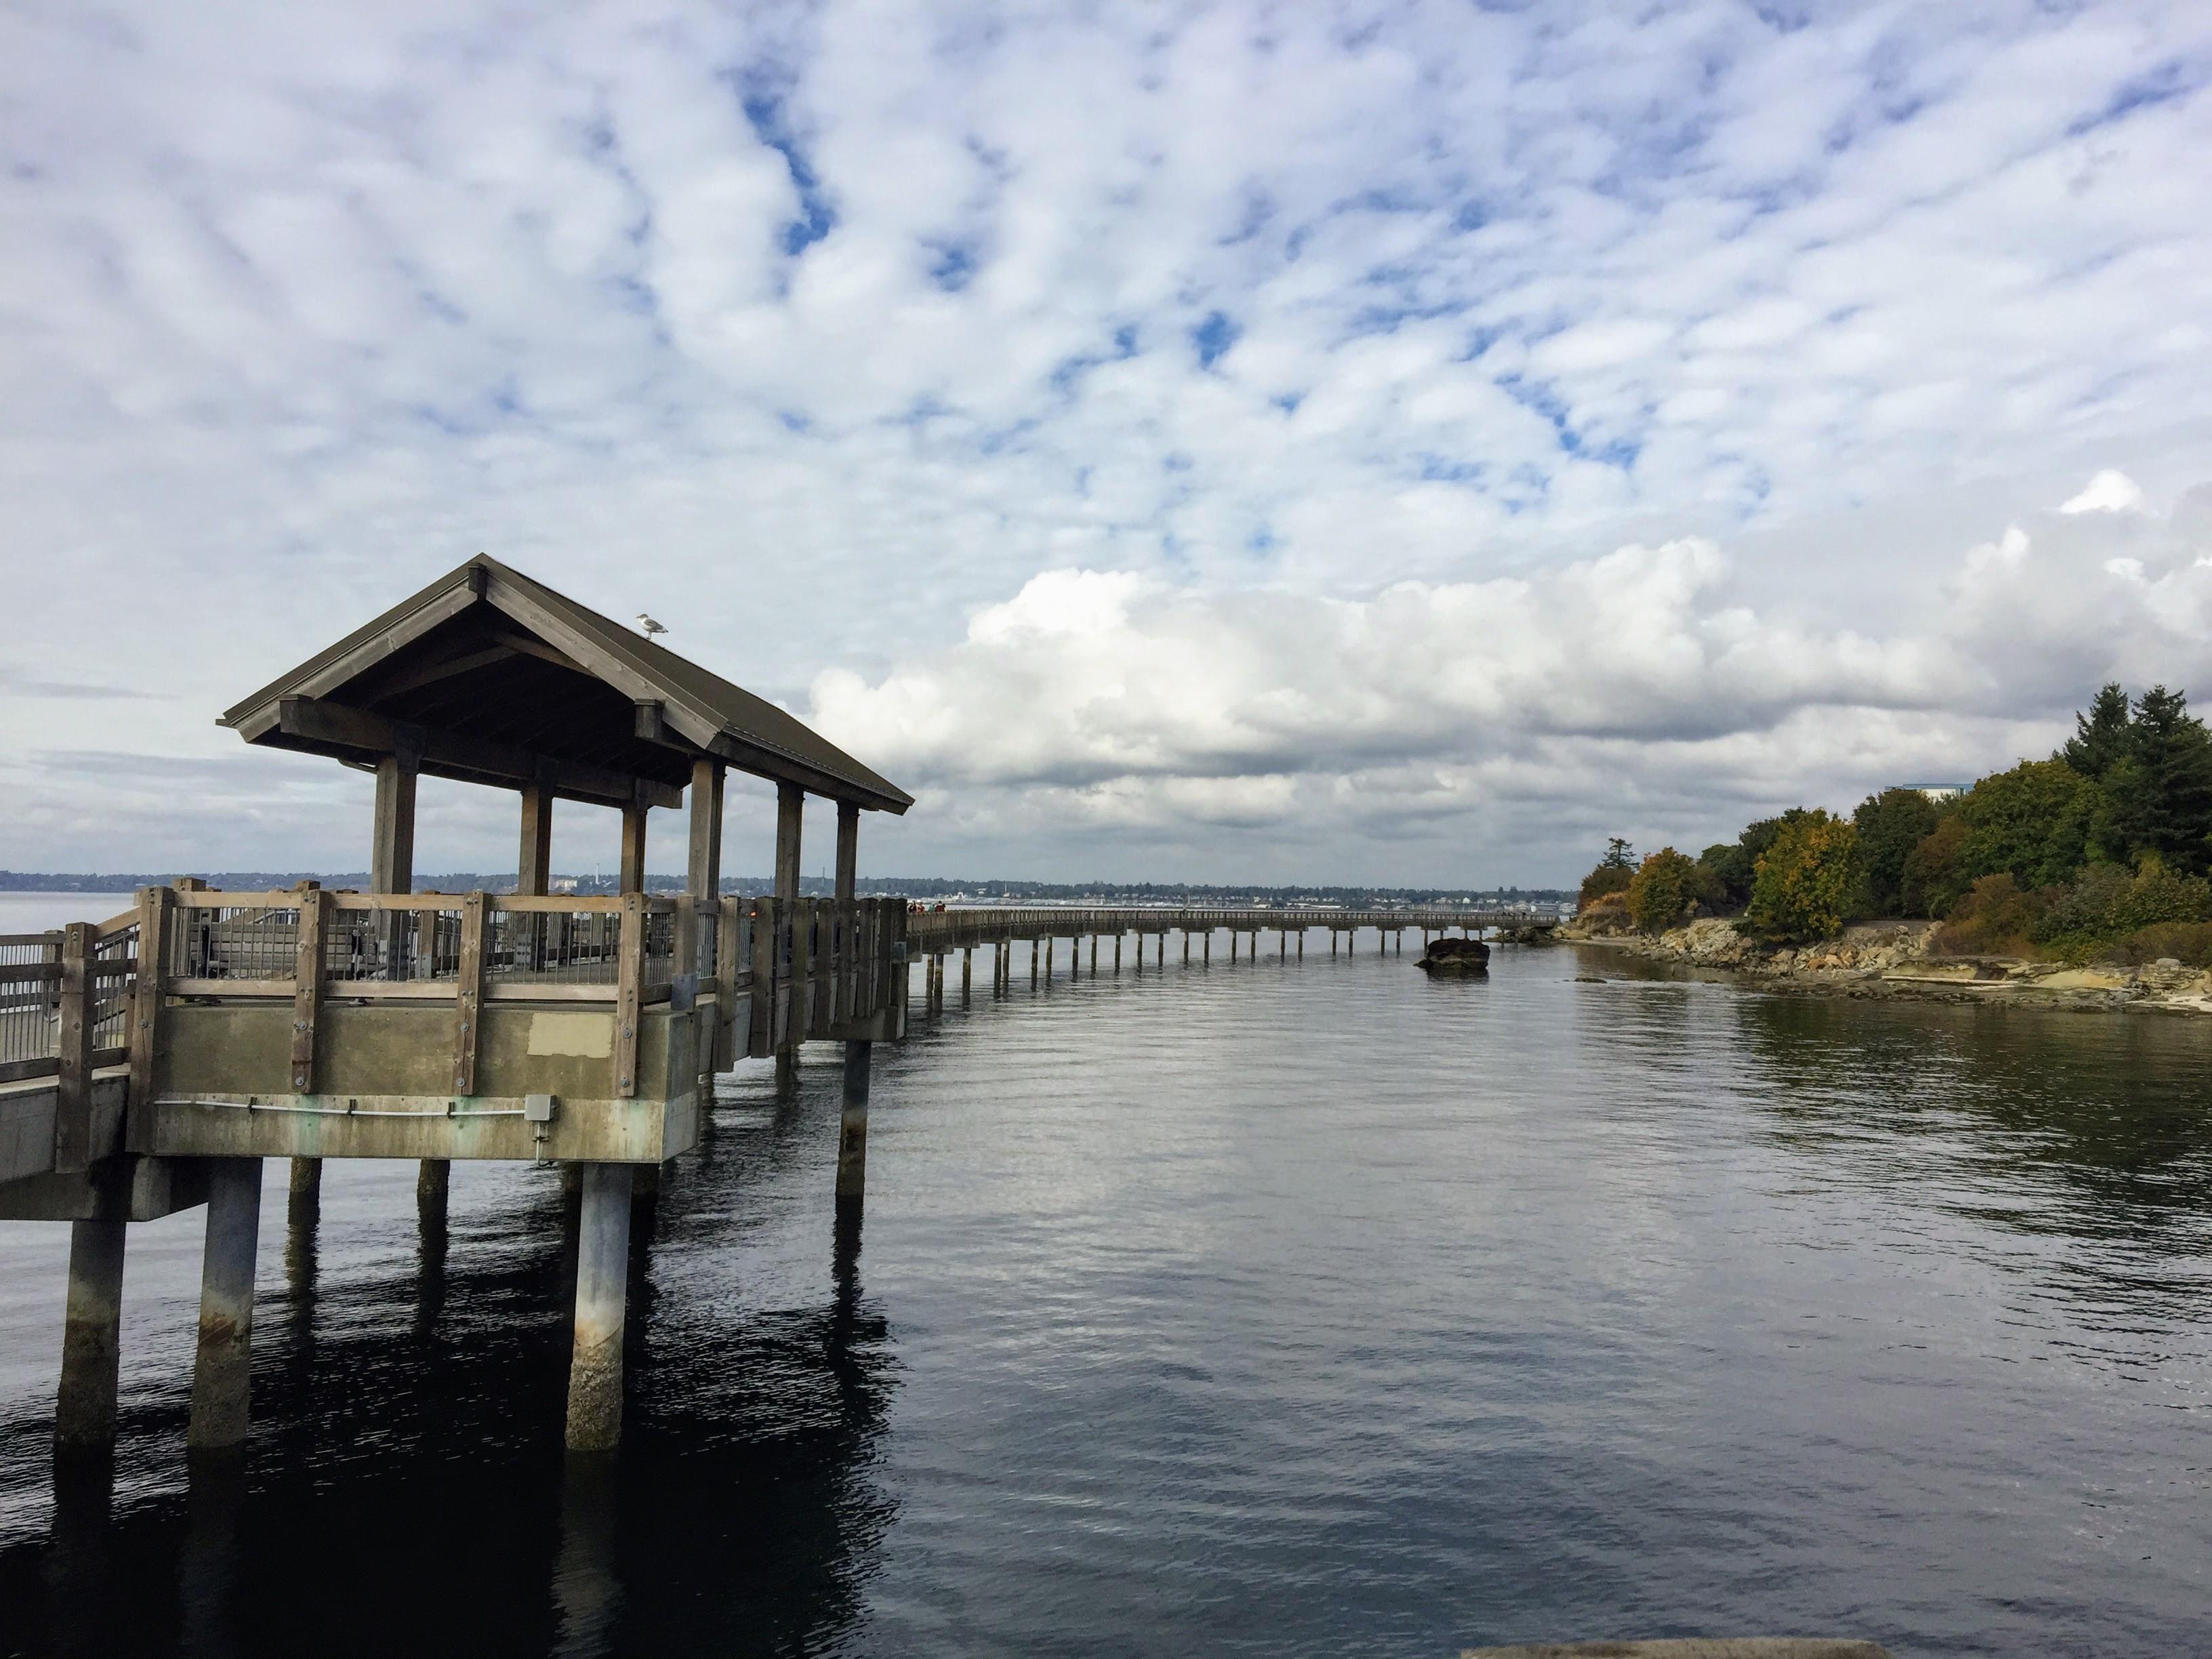 2017-09-25 Washington 02 Fairhaven 05